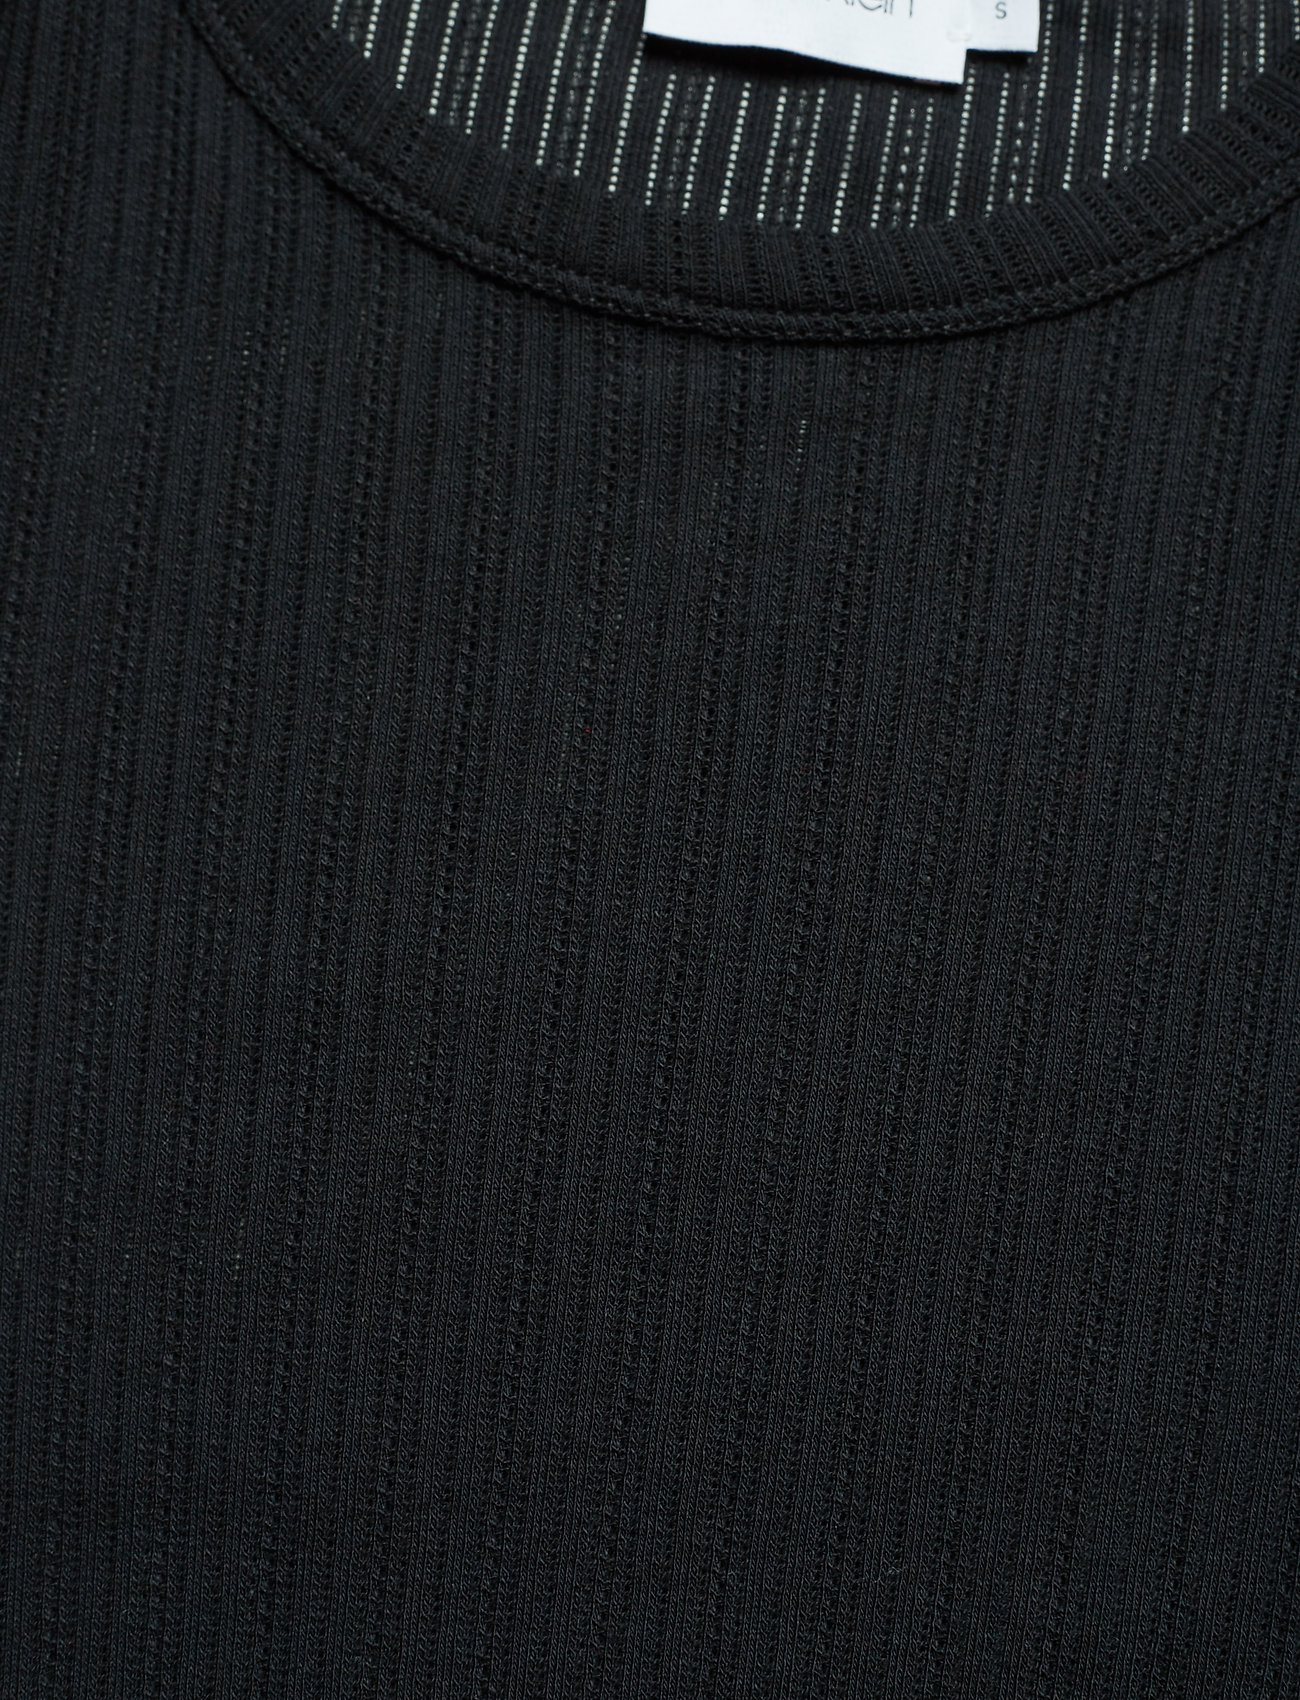 Pointelle Slvperfect BlackCalvin Klein C nk Half Detail LzpGVSUMjq